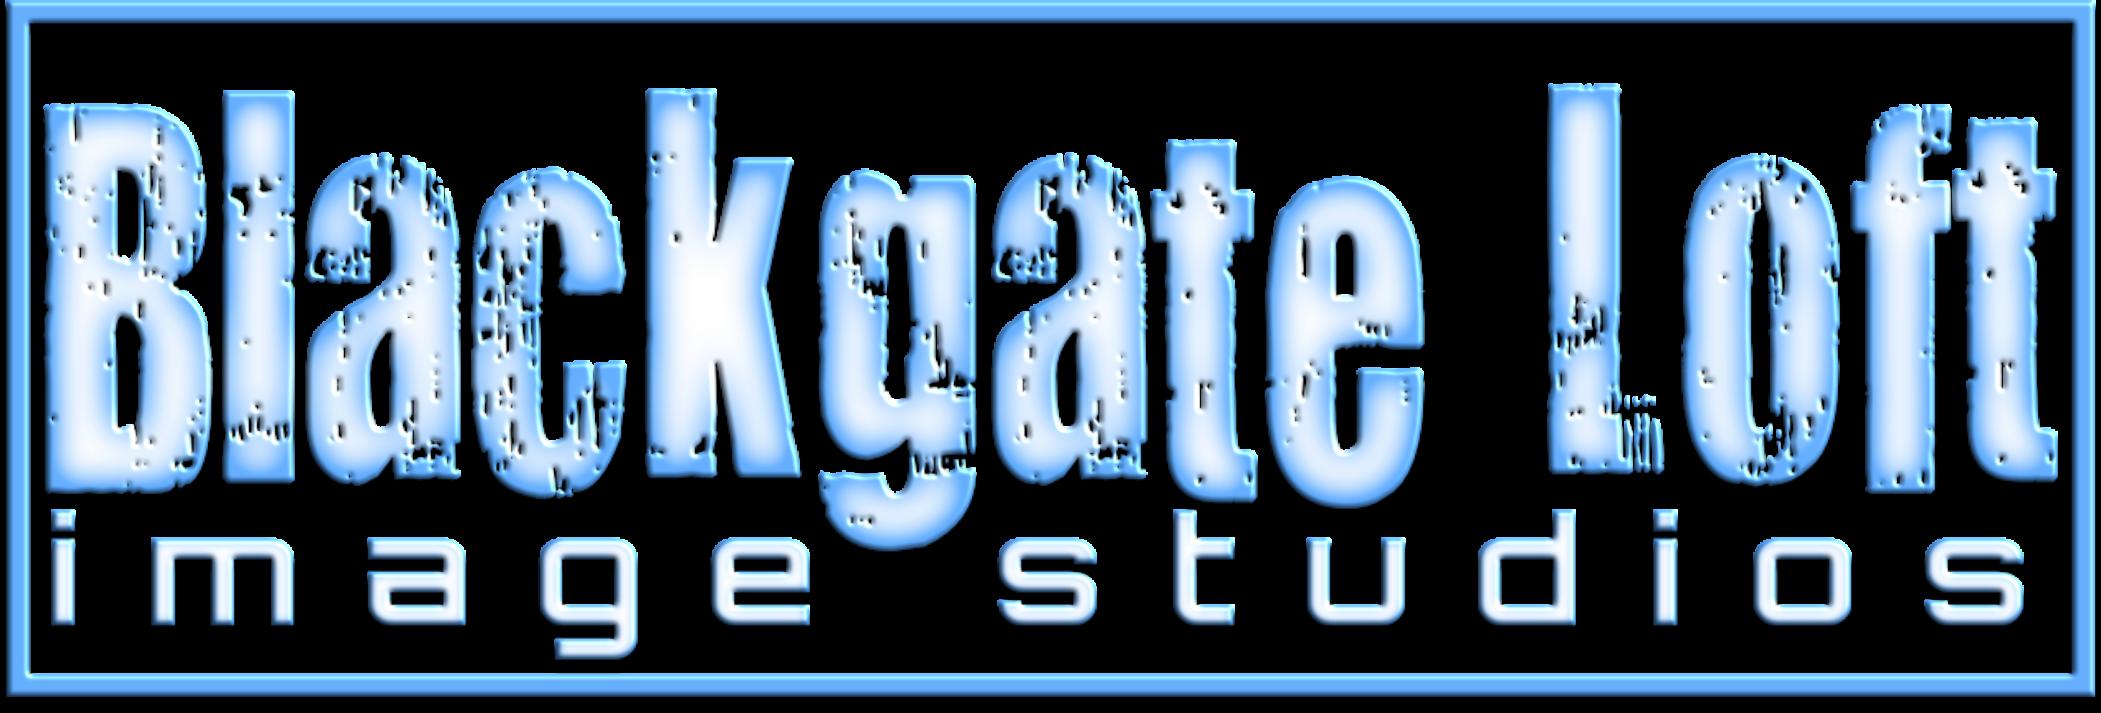 blackgate loft image studios  wpchambercouk